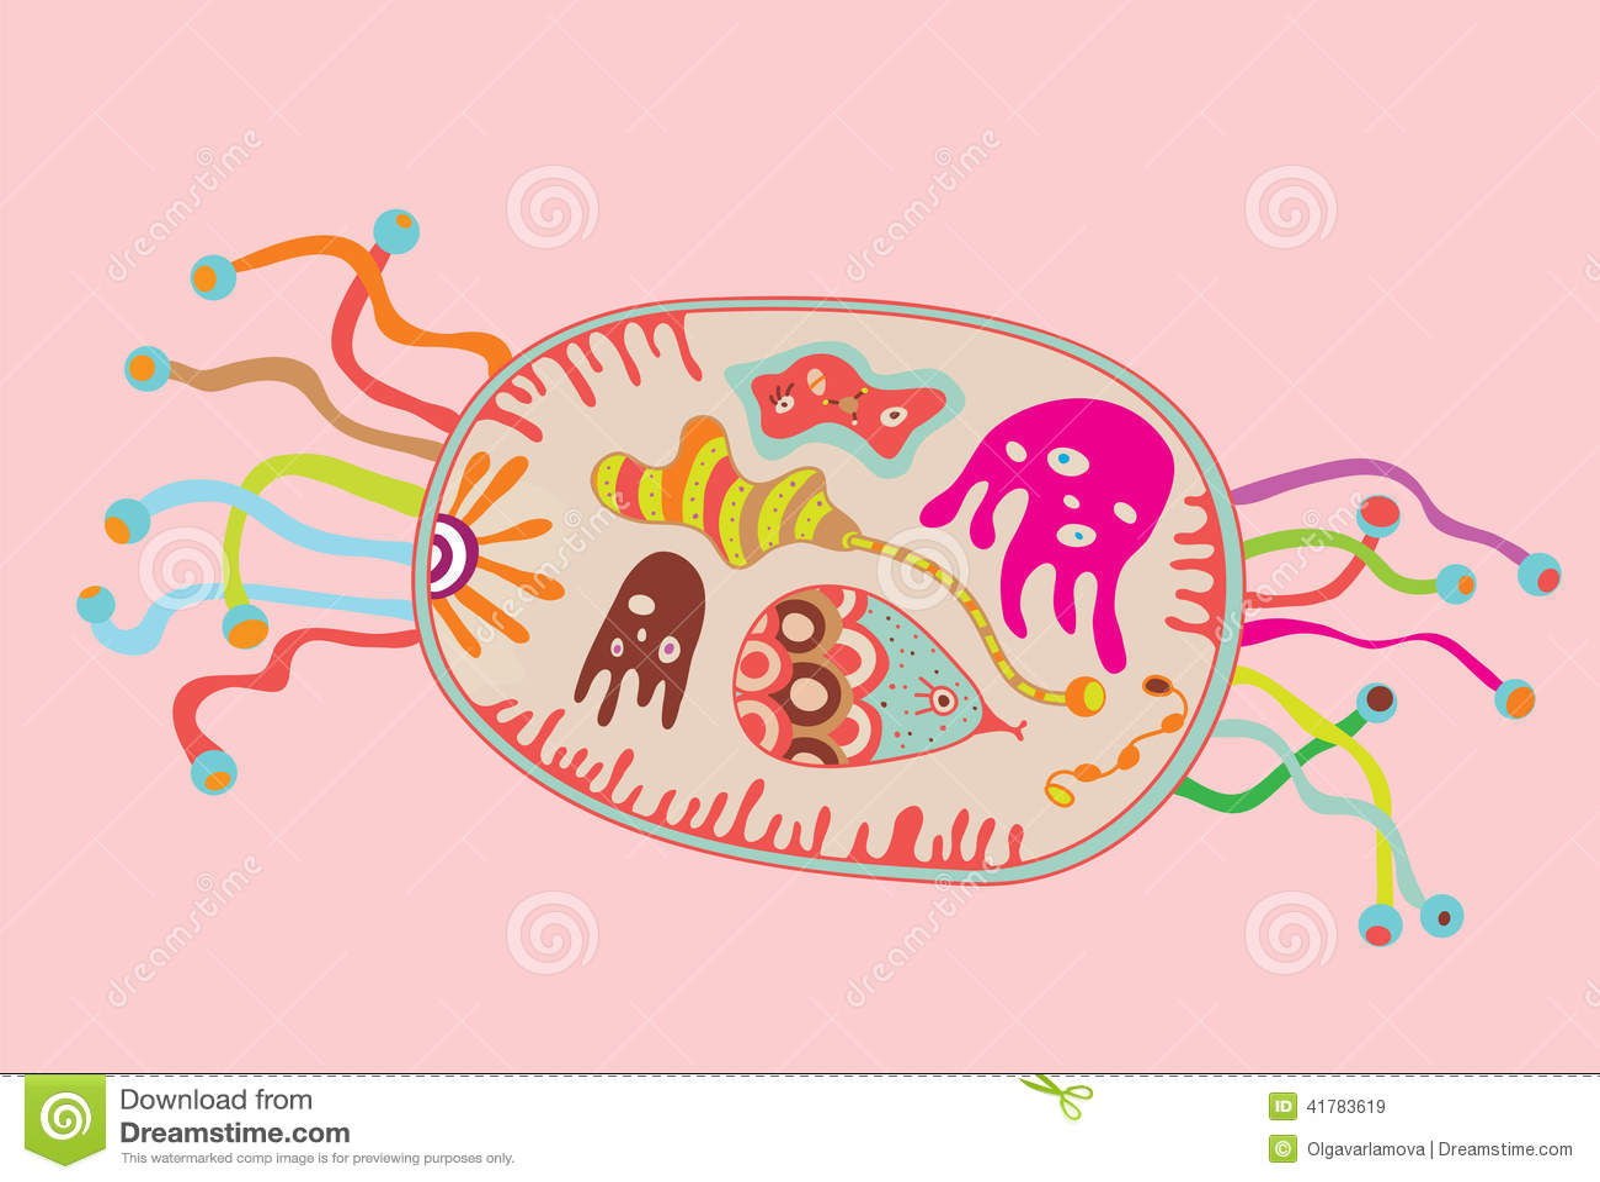 Cartoon Cell Stock Vector - Image: 41783619